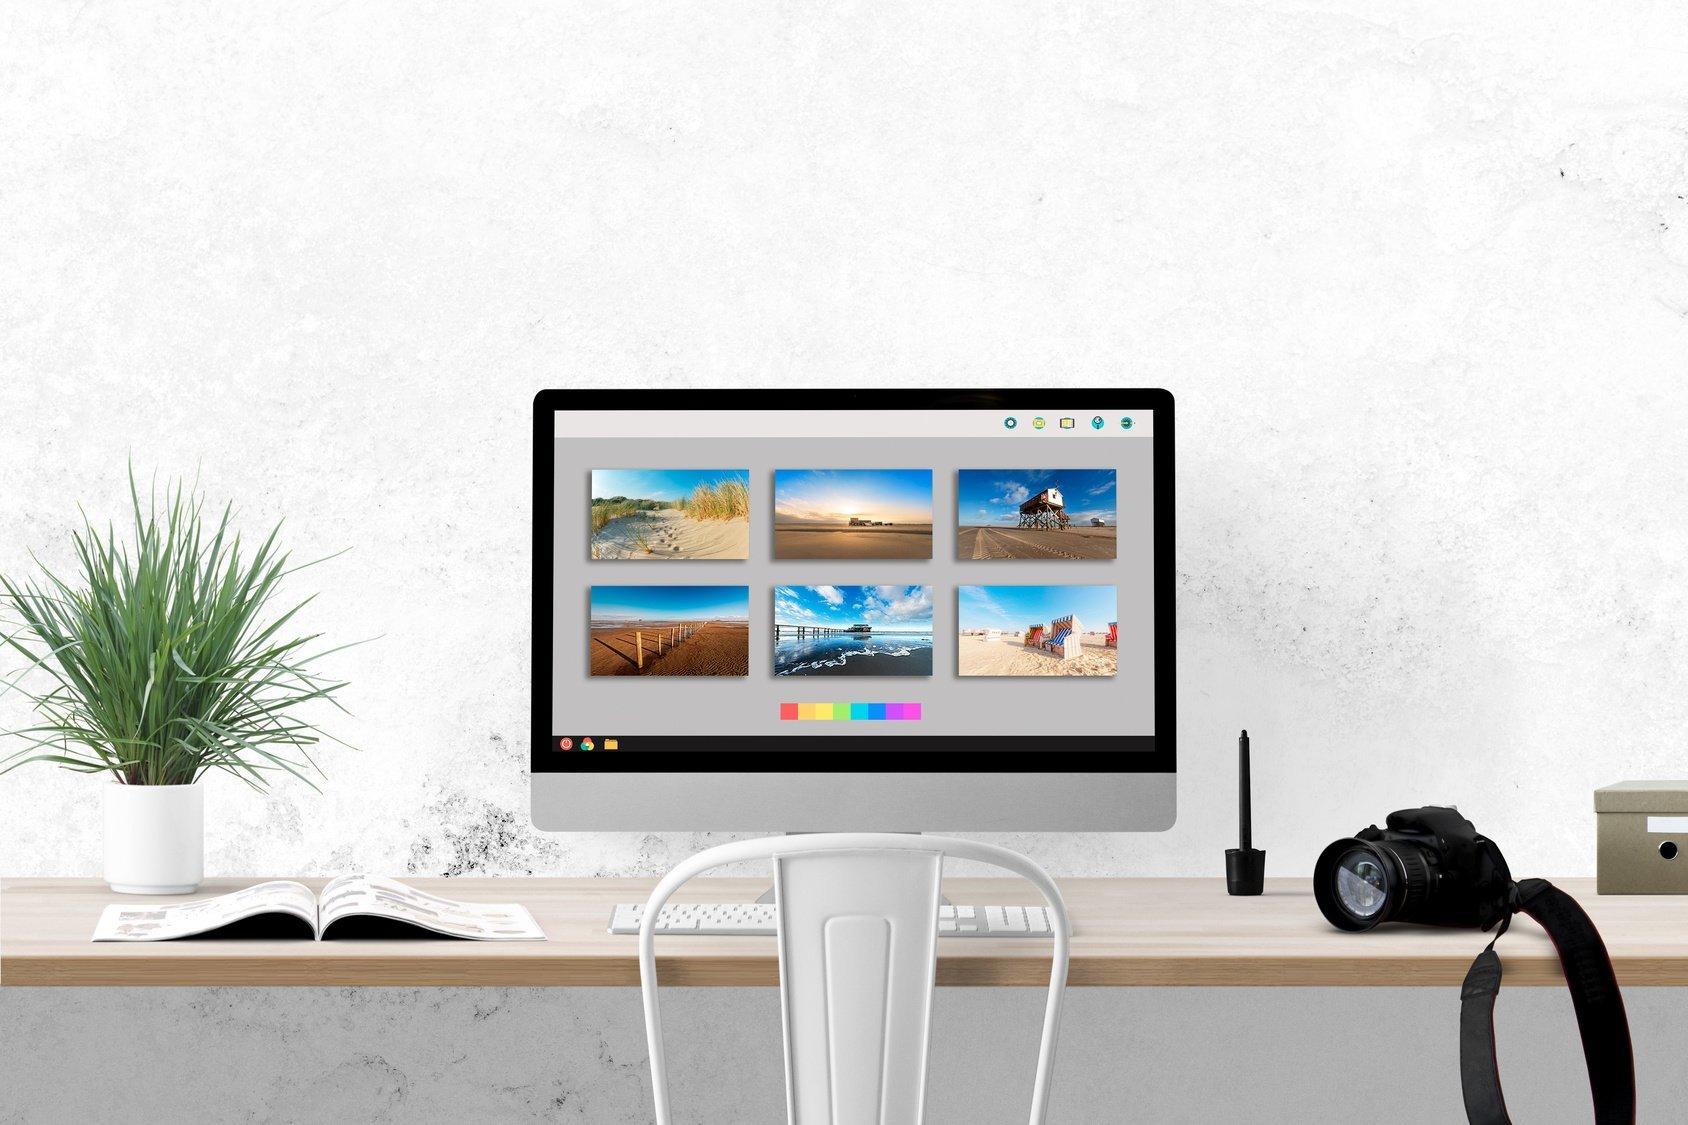 Fotolia.com/reichdernatur